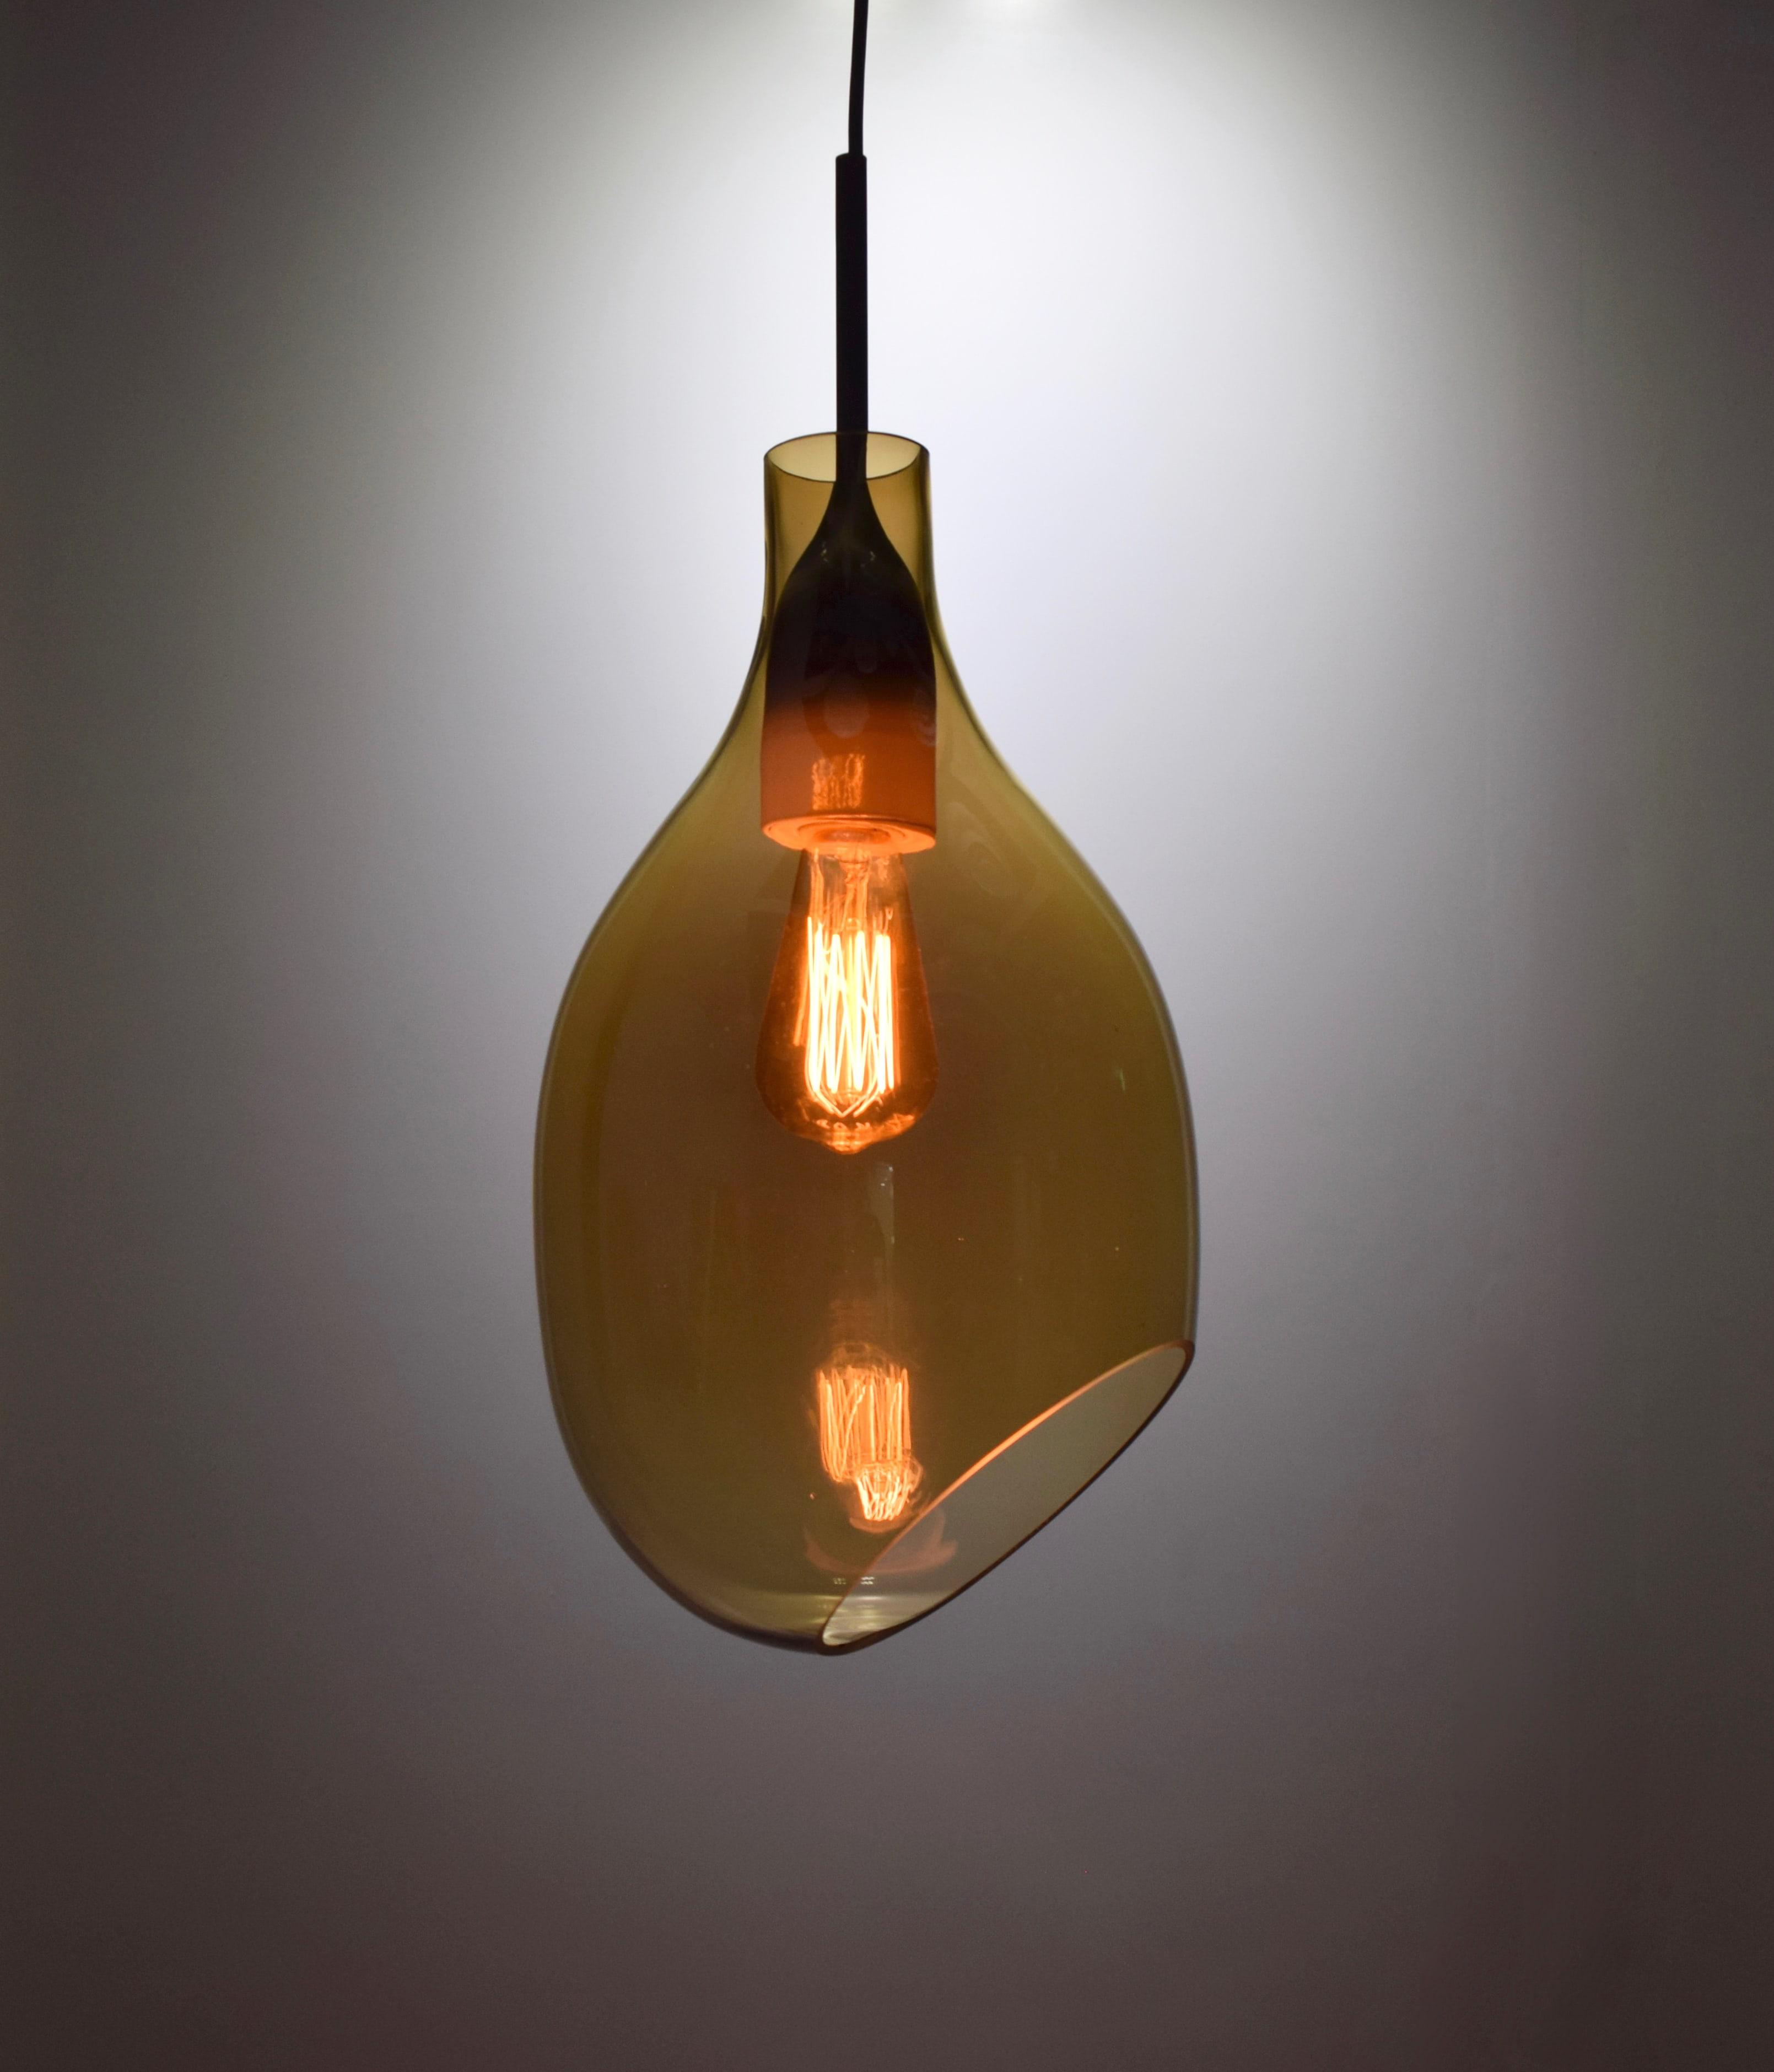 VESSEL 斜口玻璃琥珀色吊燈-BNL00126 0